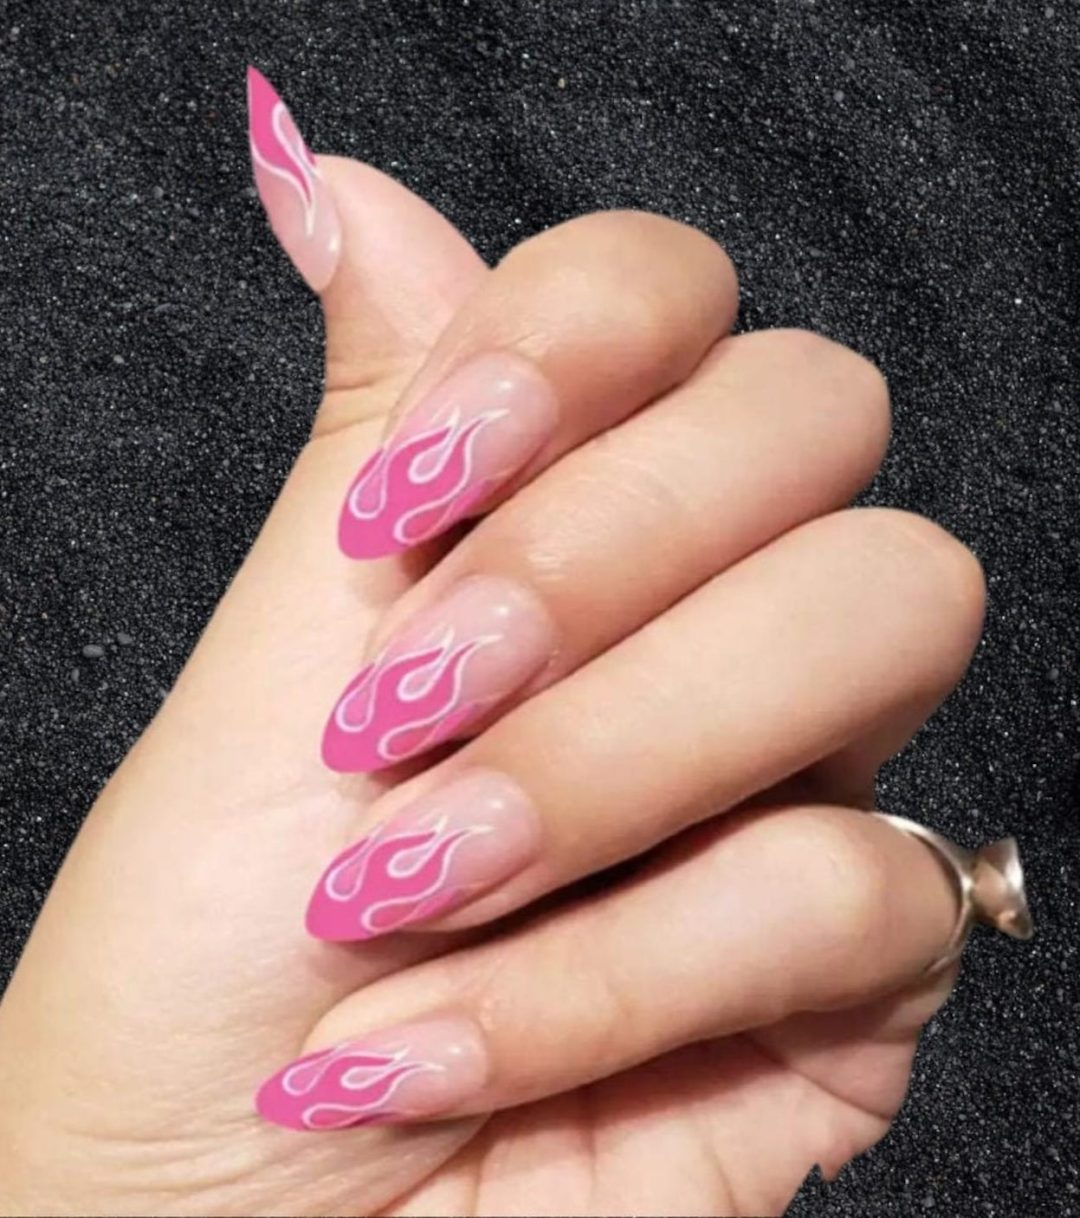 Hot pink flame nails